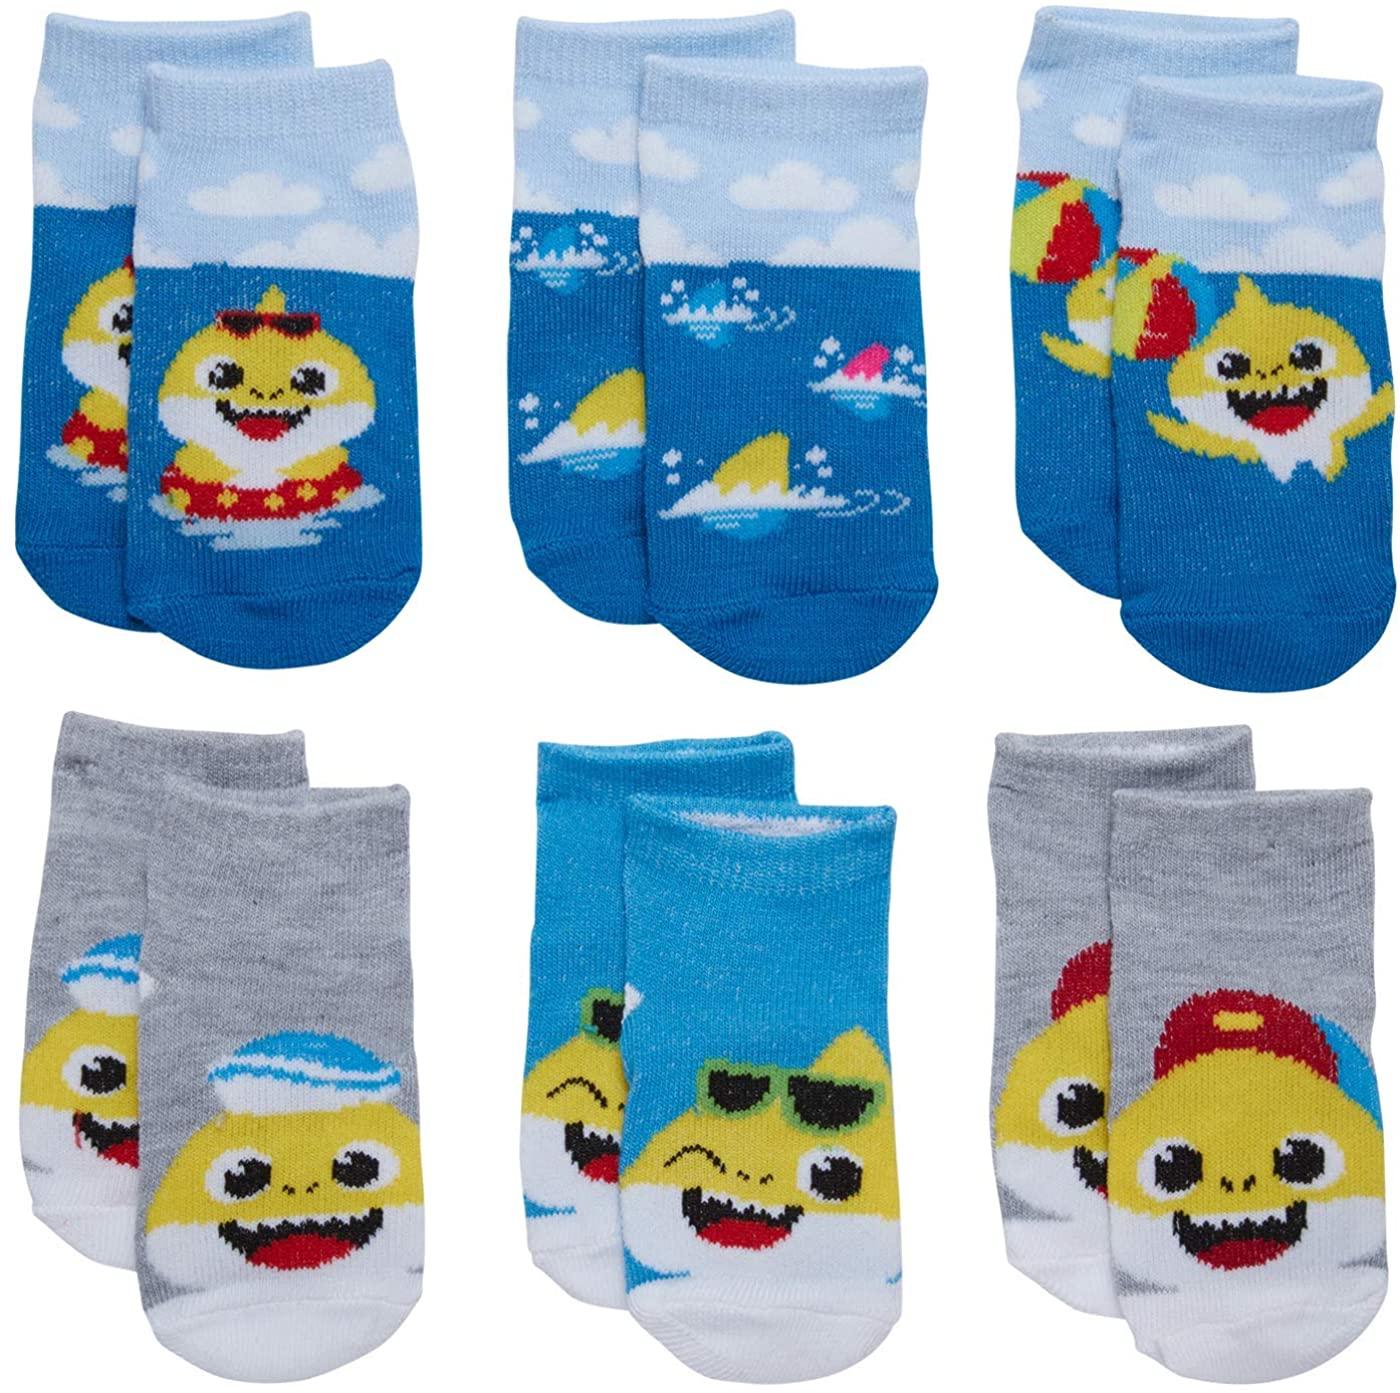 Nickelodeon Infant Boys' & Girls' Baby Shark Low Cut Socks (6 Pack)